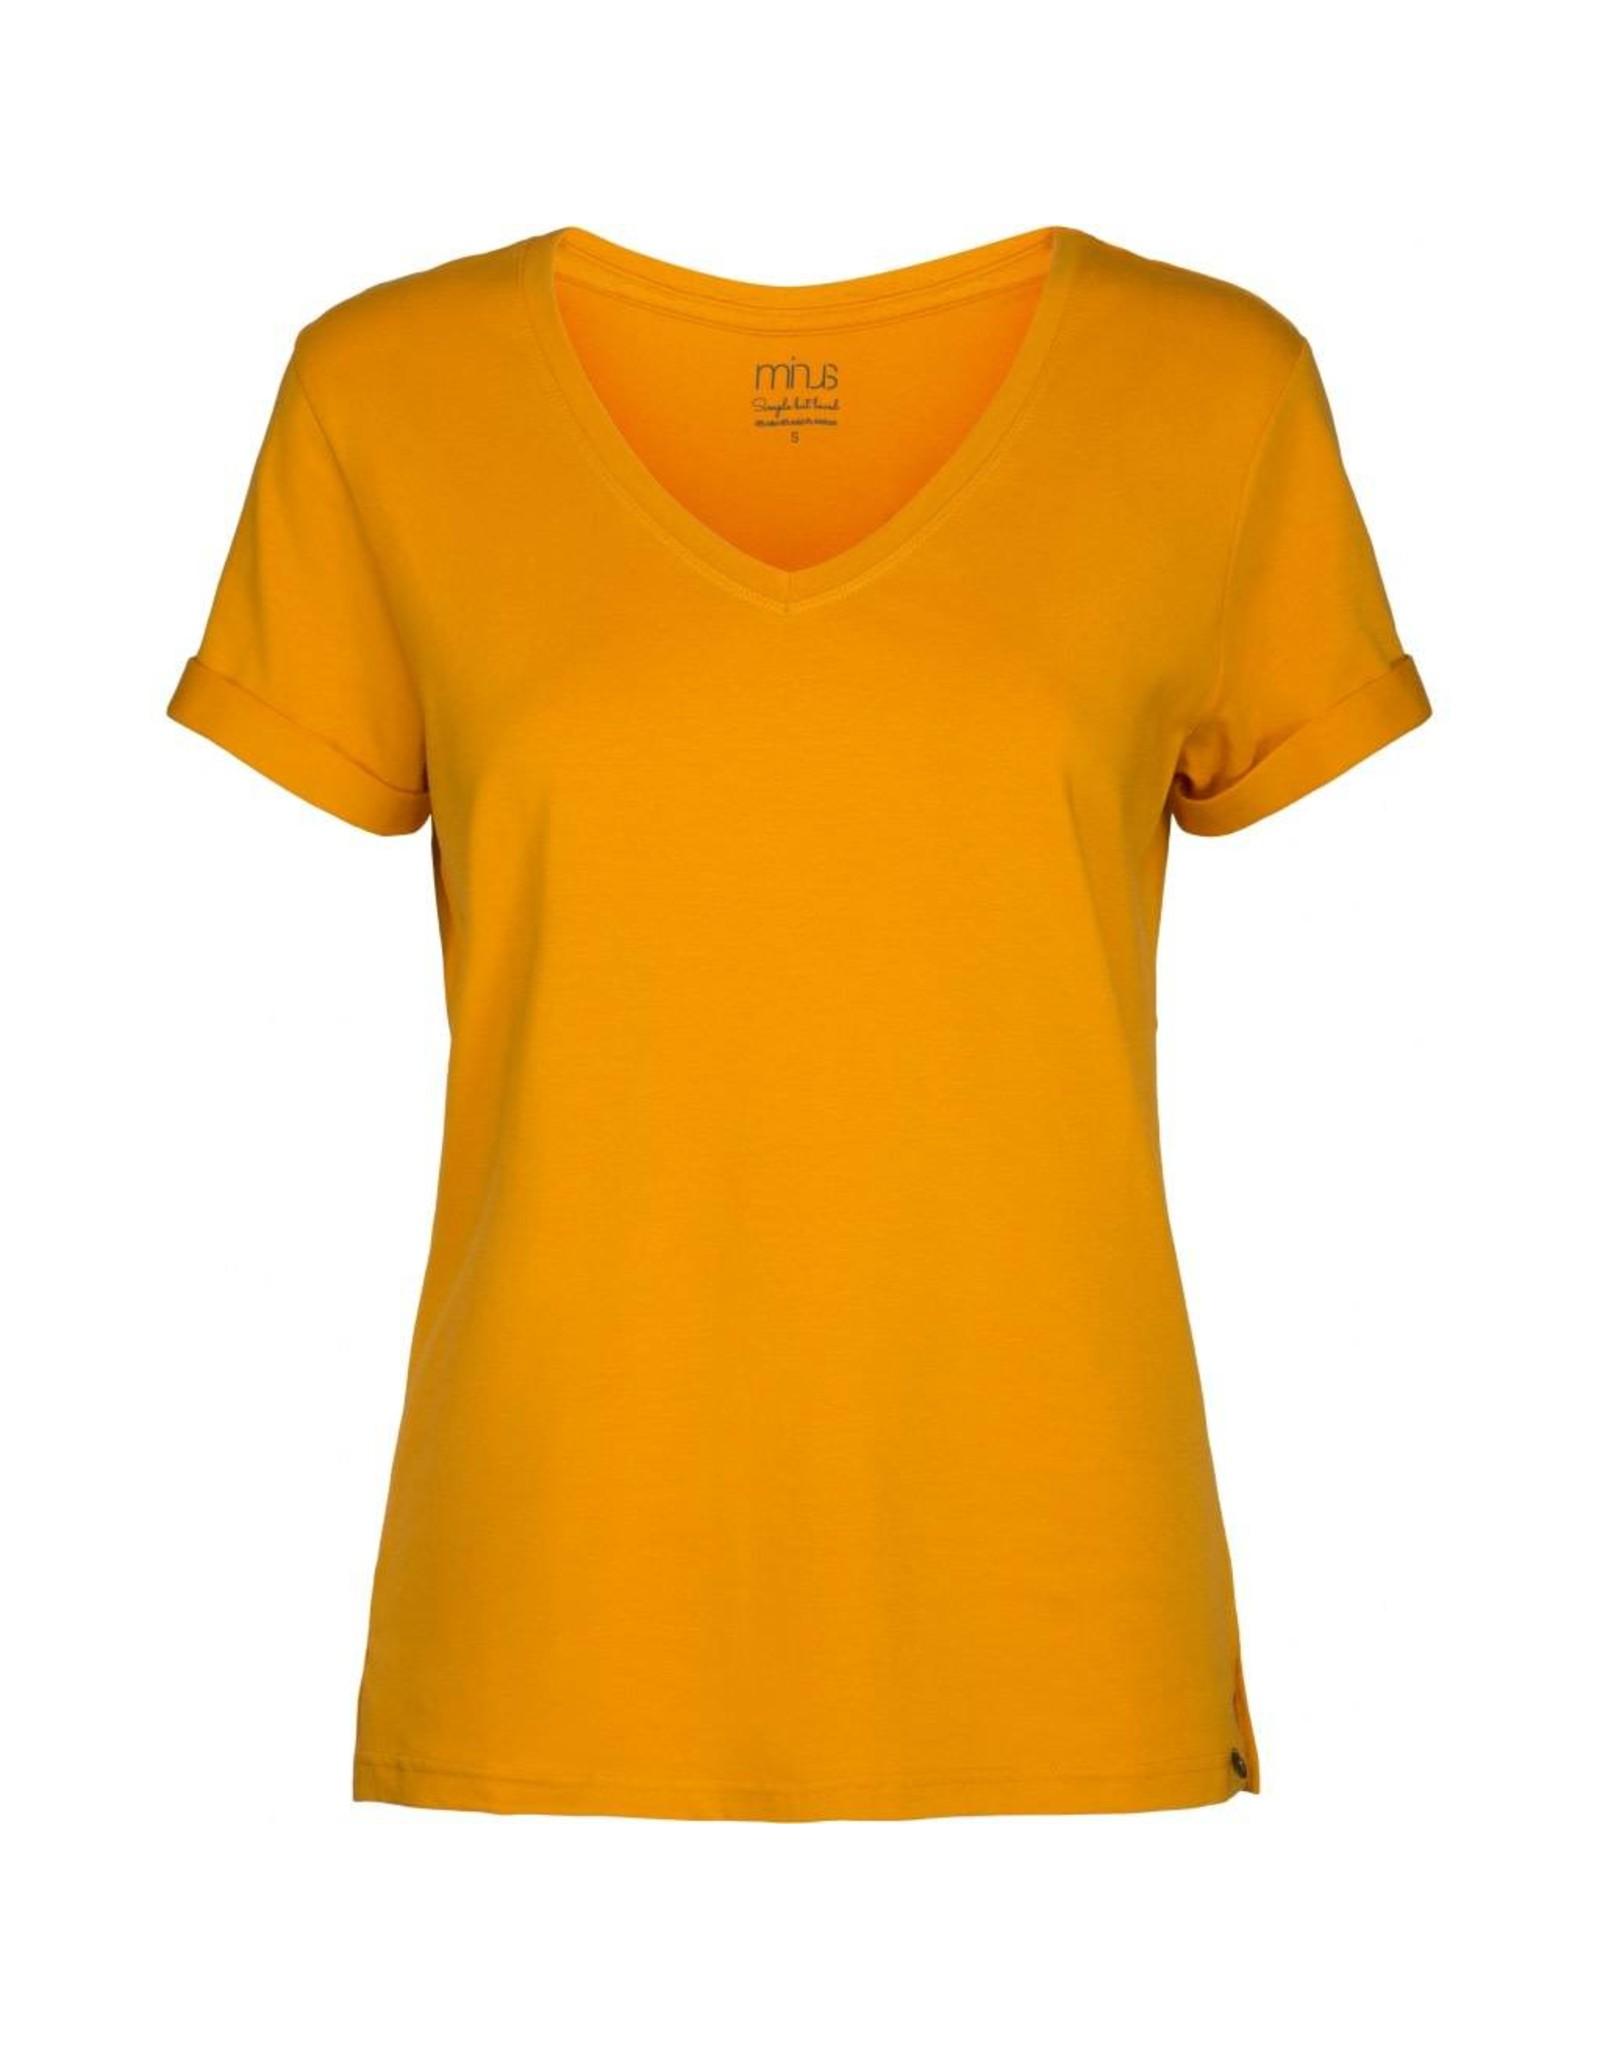 Minus Adele T Orange